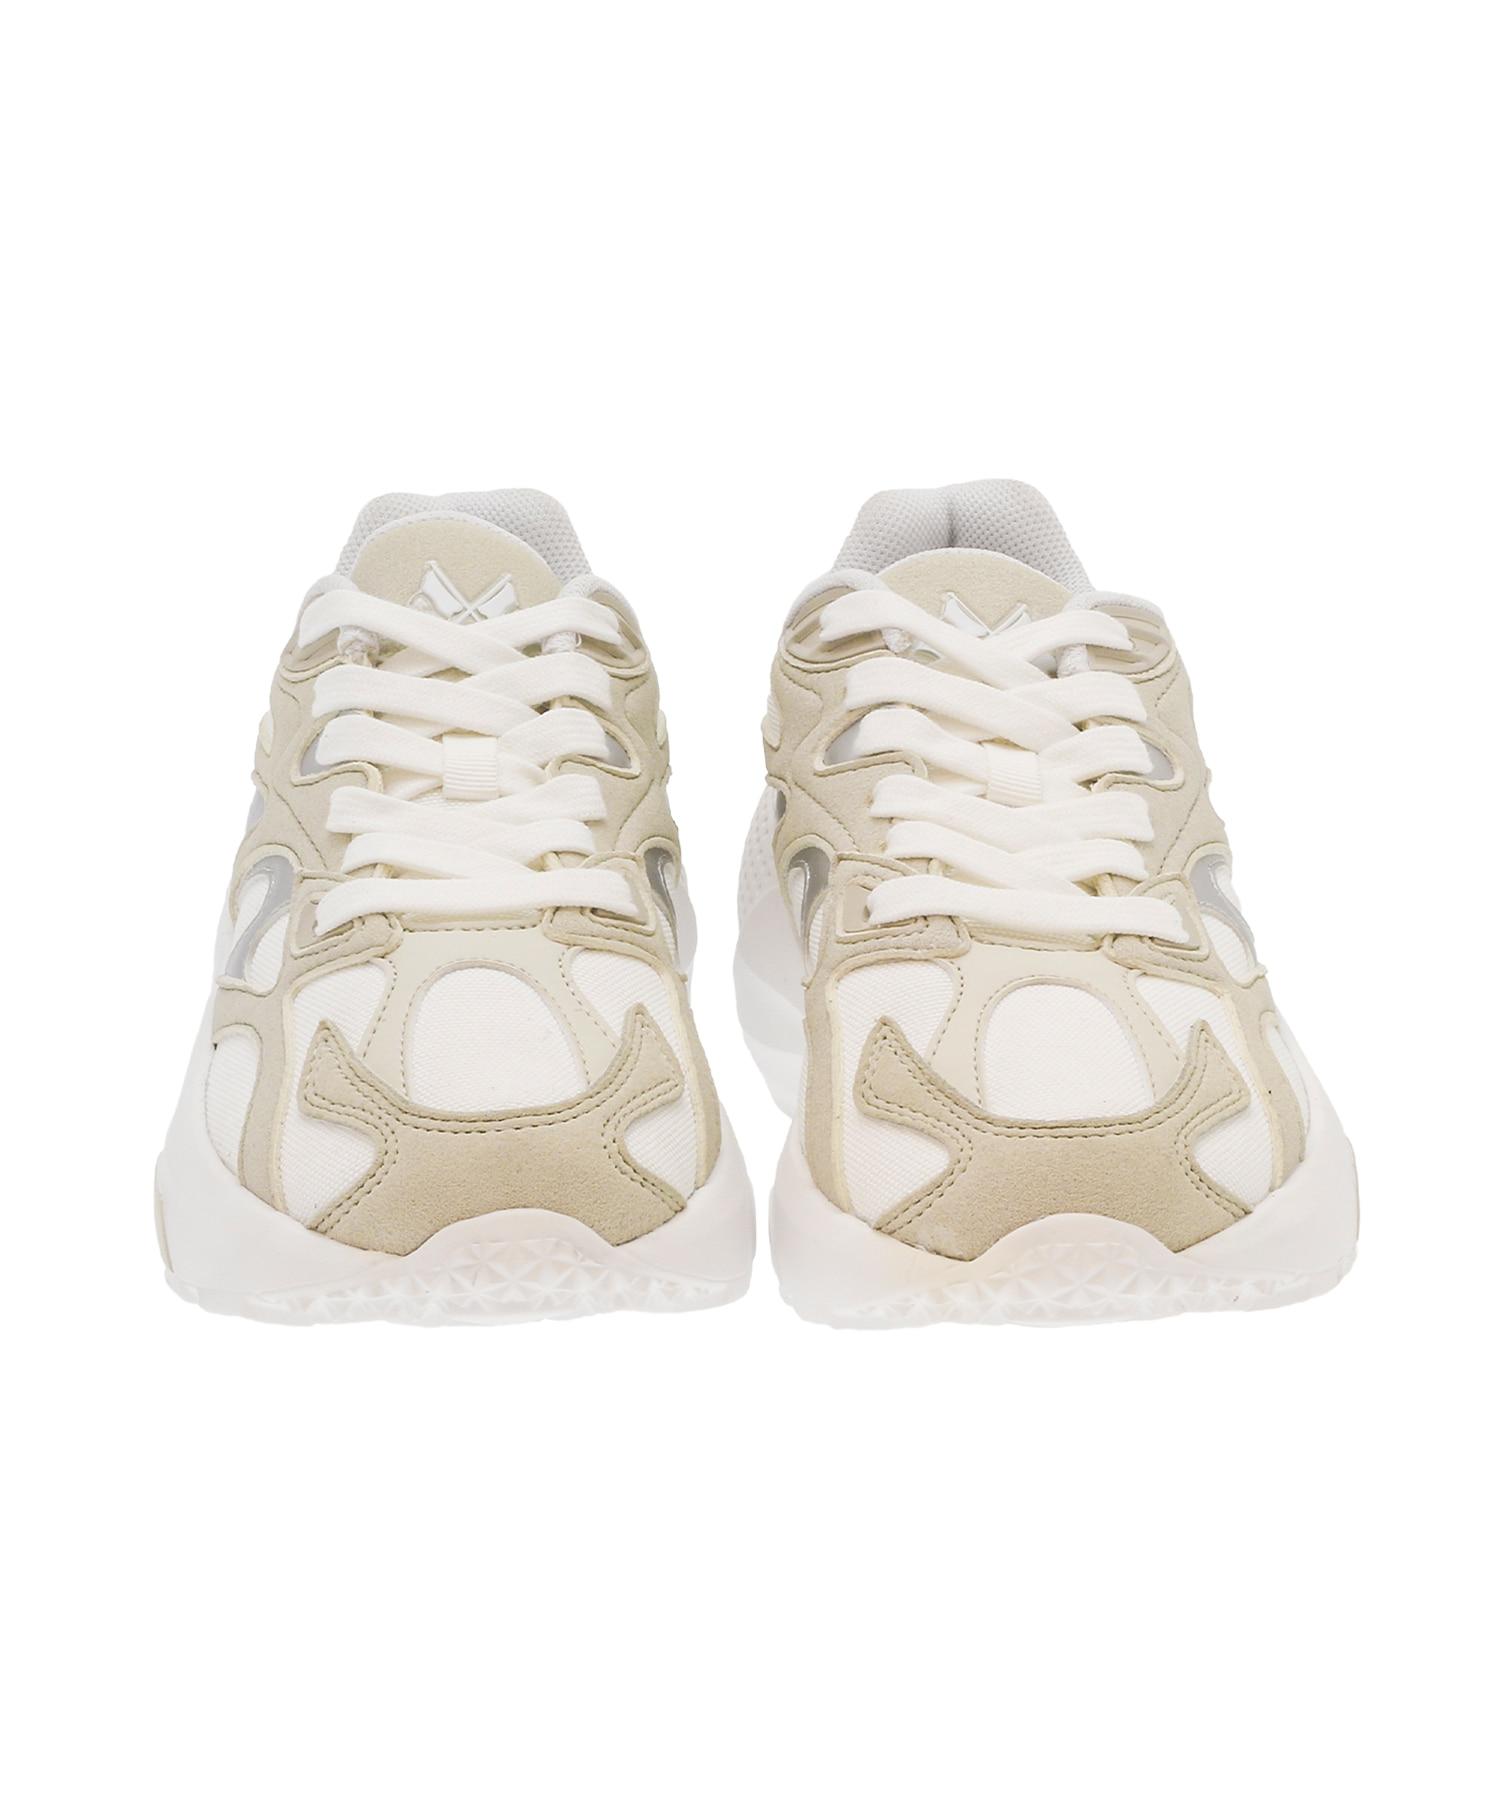 Jean Paul Aix sneakers